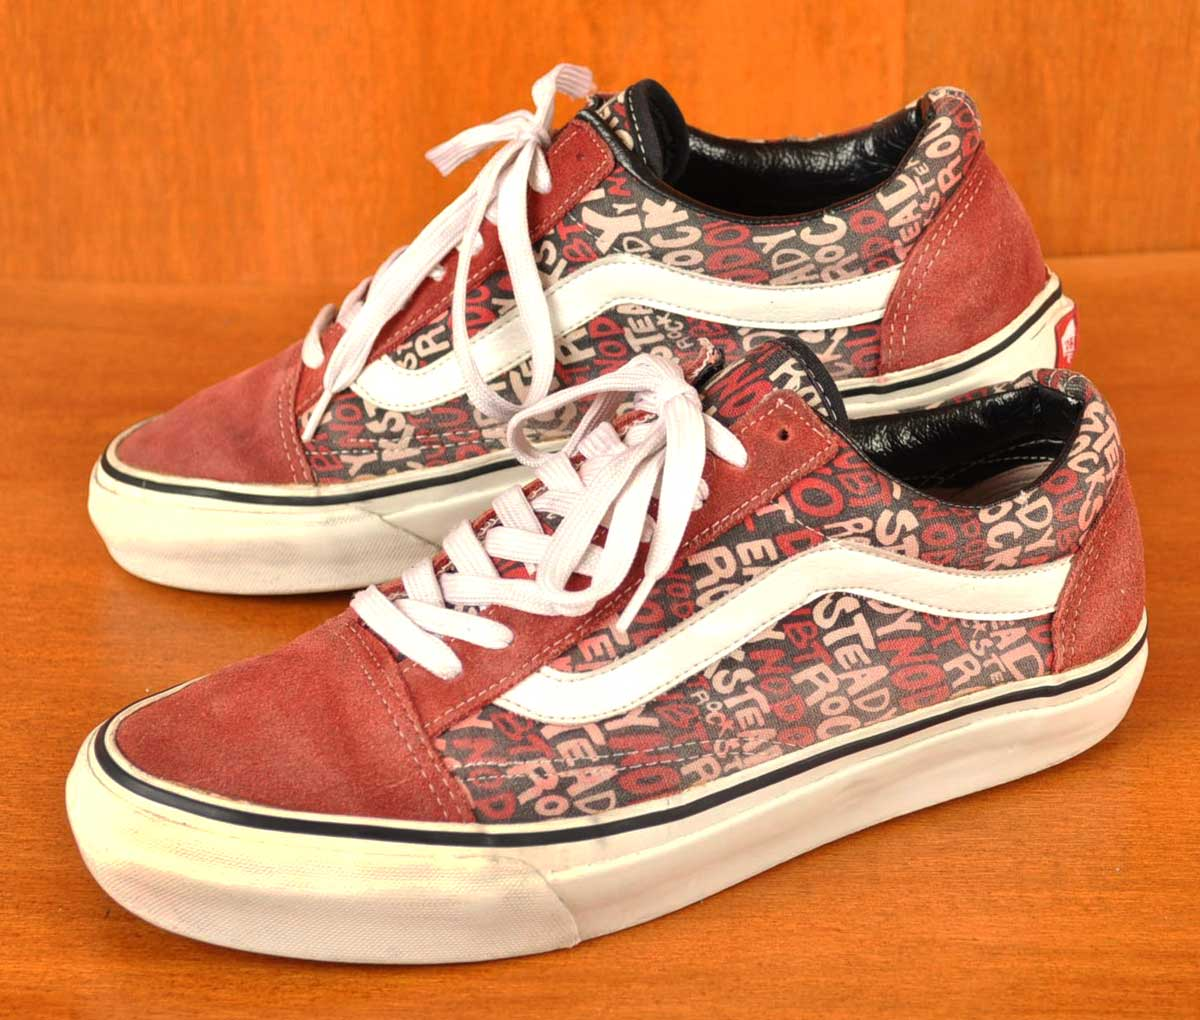 00's ~ VANS x NODOUBT vans x no doubt OLD SKOOL old school skate shoes red suede x white letter print canvas JPN27.0cm: